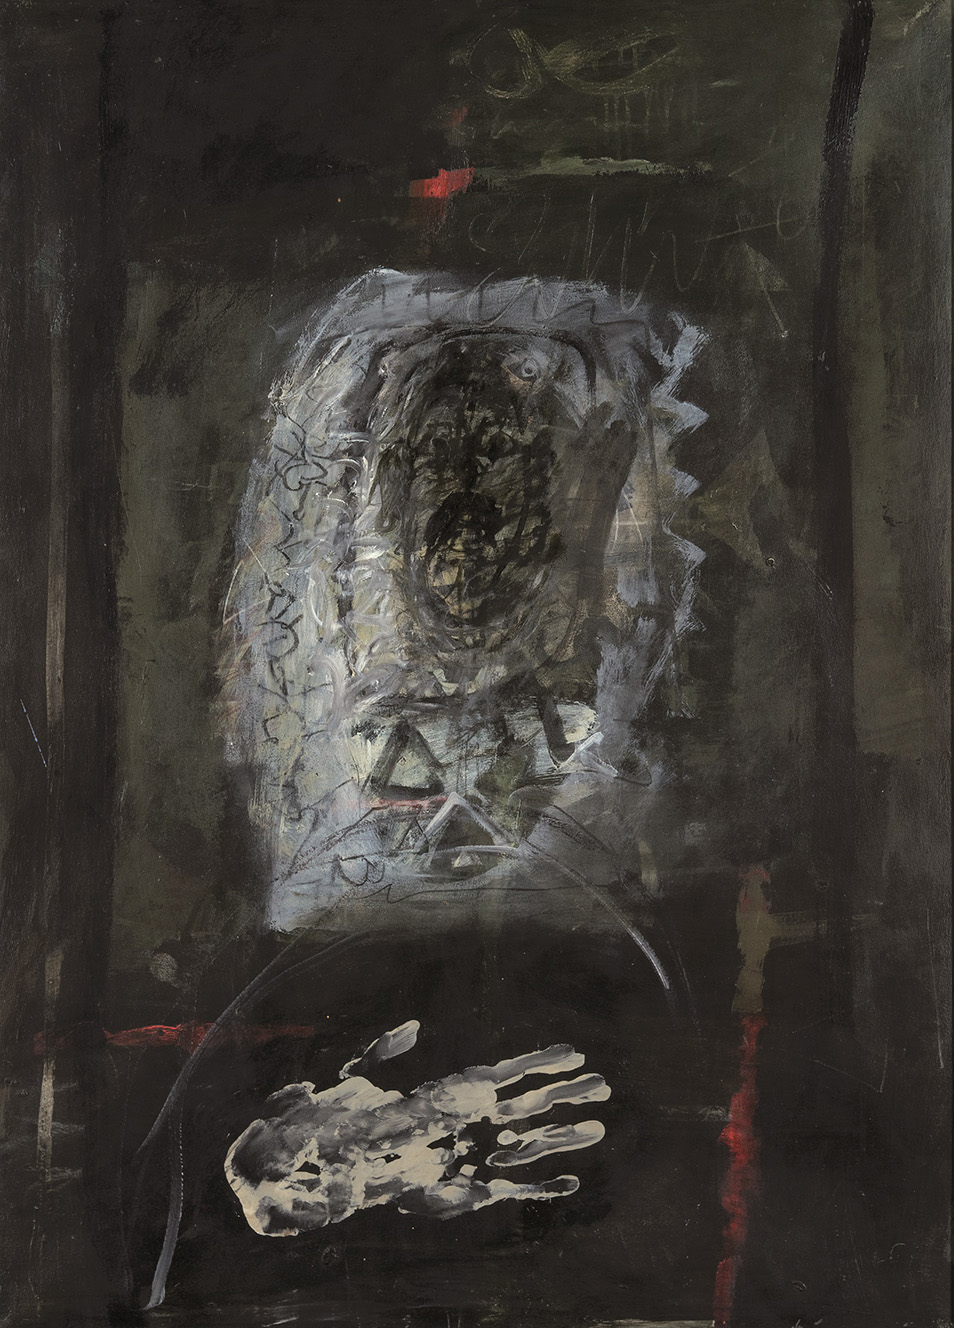 Antoni Clavé. Main blanche, 1965. Salida: 36.000 euros. No vendido